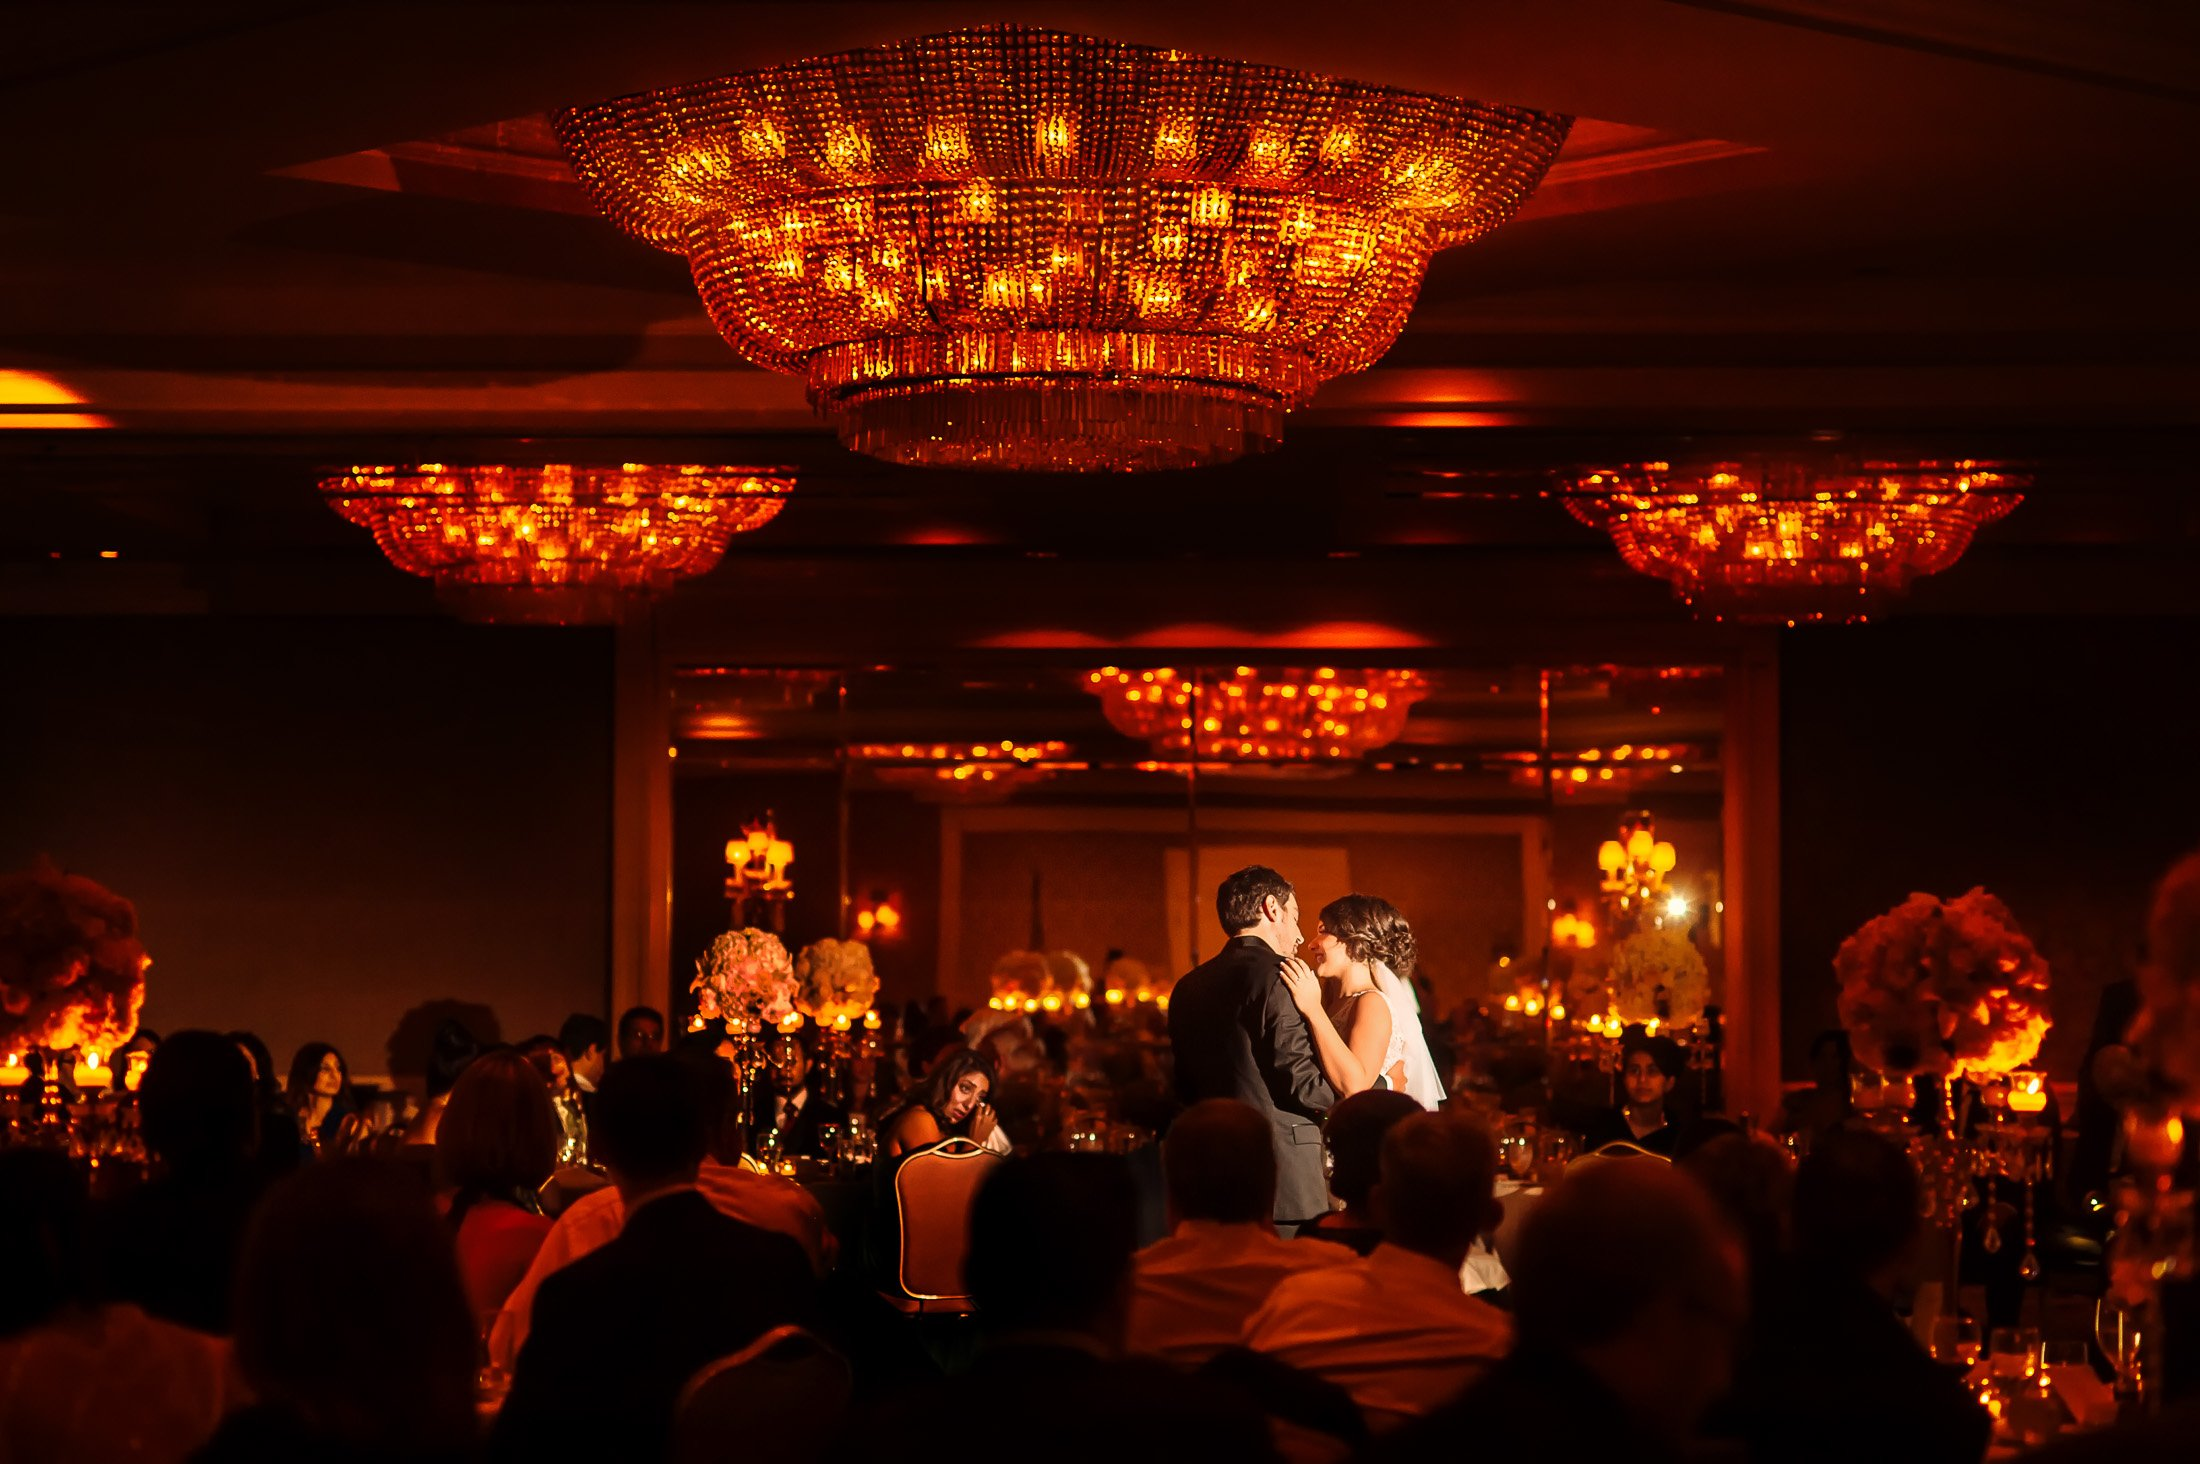 sutton place hotel vancouver wedding